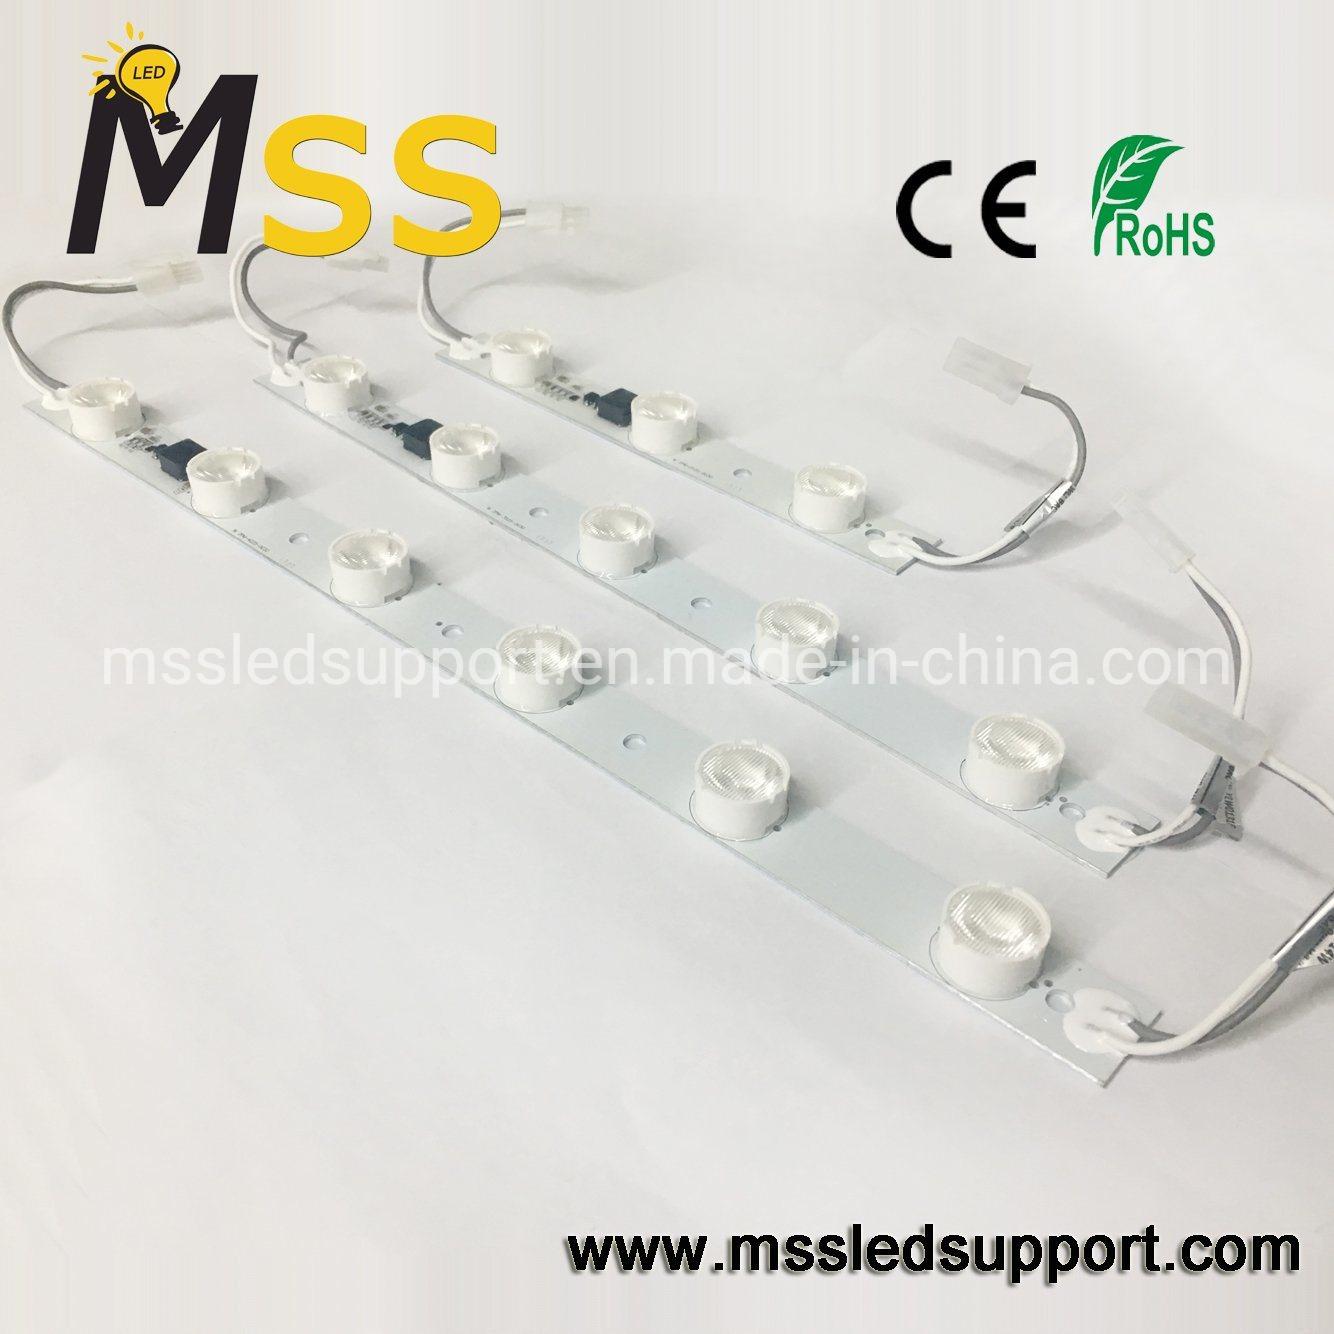 Hot Item High 24v Led Lighting Bar For Display Case Jewelry Light Box